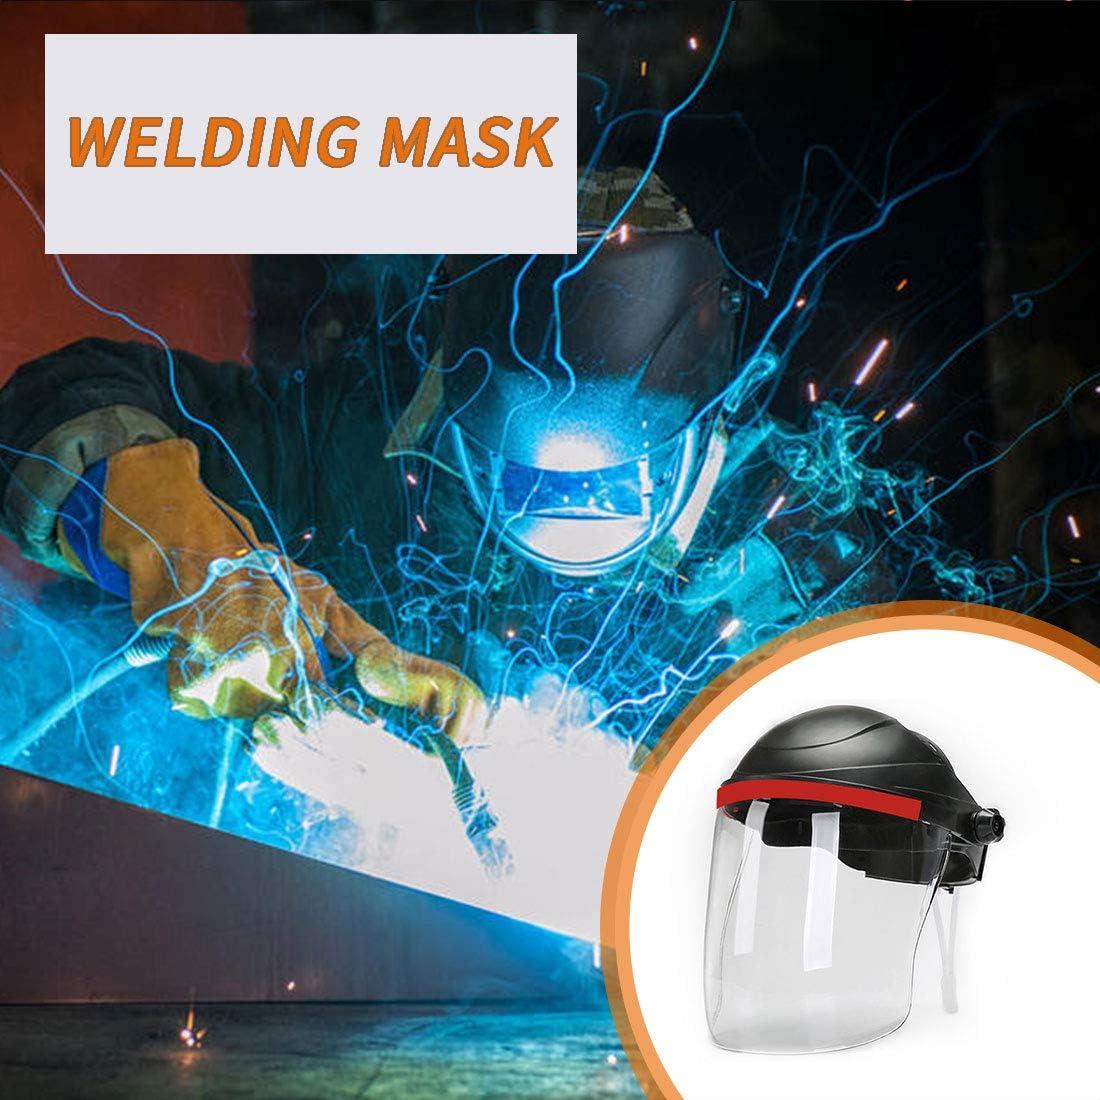 Clear Polycarbonate Window welding helmet grinding face shield,Multi-Purpose Single Crown with Ratchet Headgear Anti-Fog Coating,welding helmet